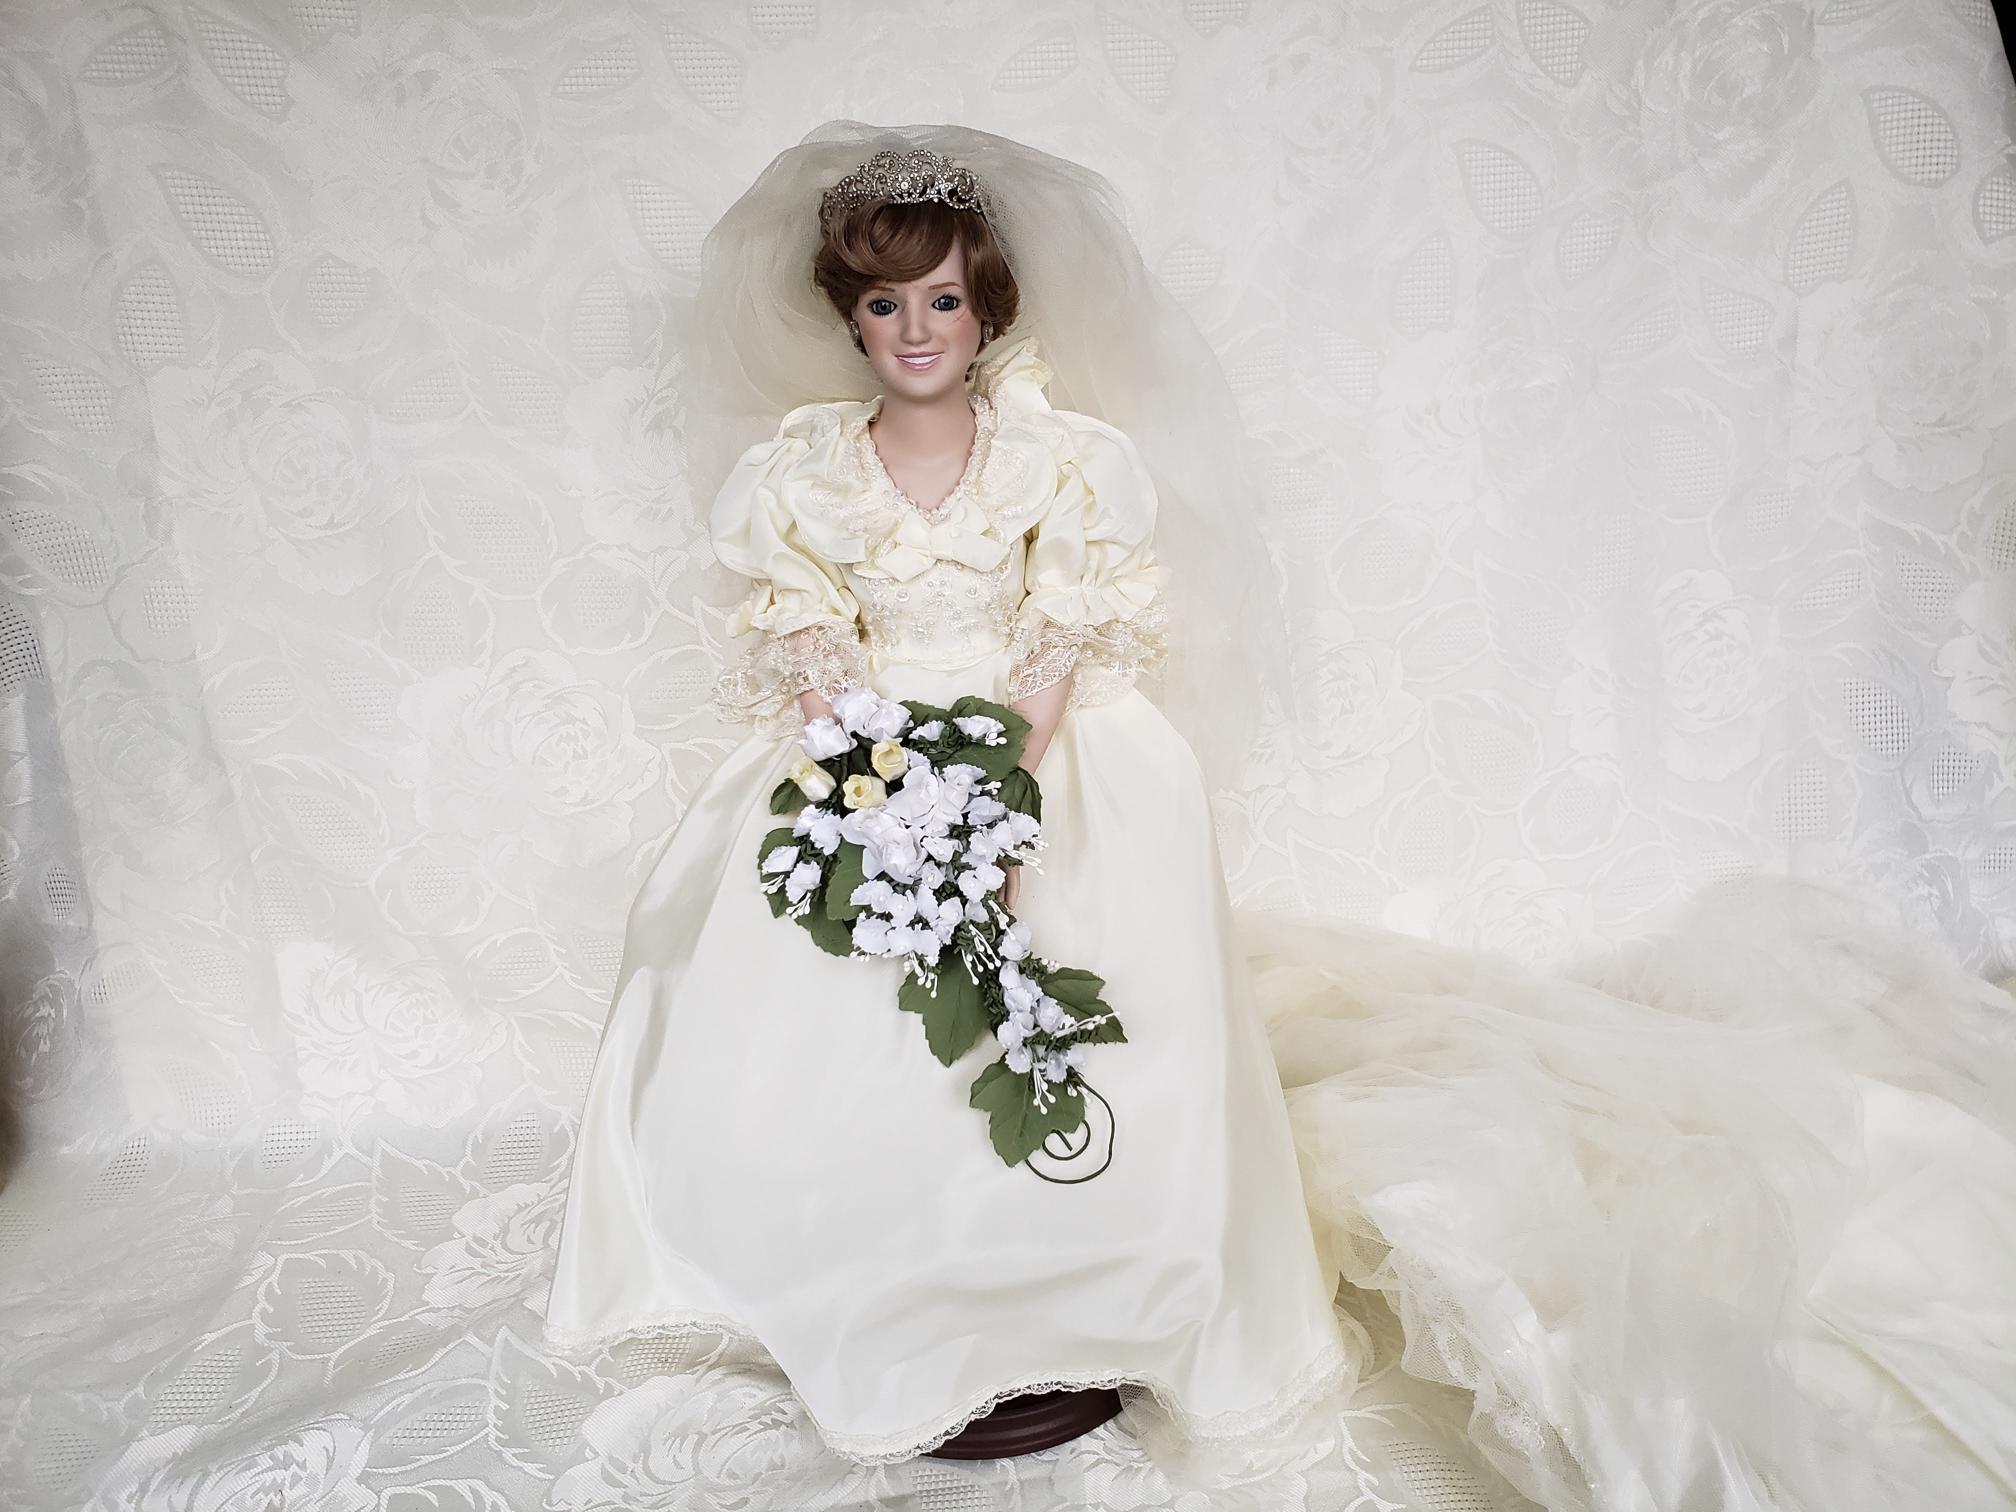 Princess Diana Bride Doll Aunt Gladys Attic